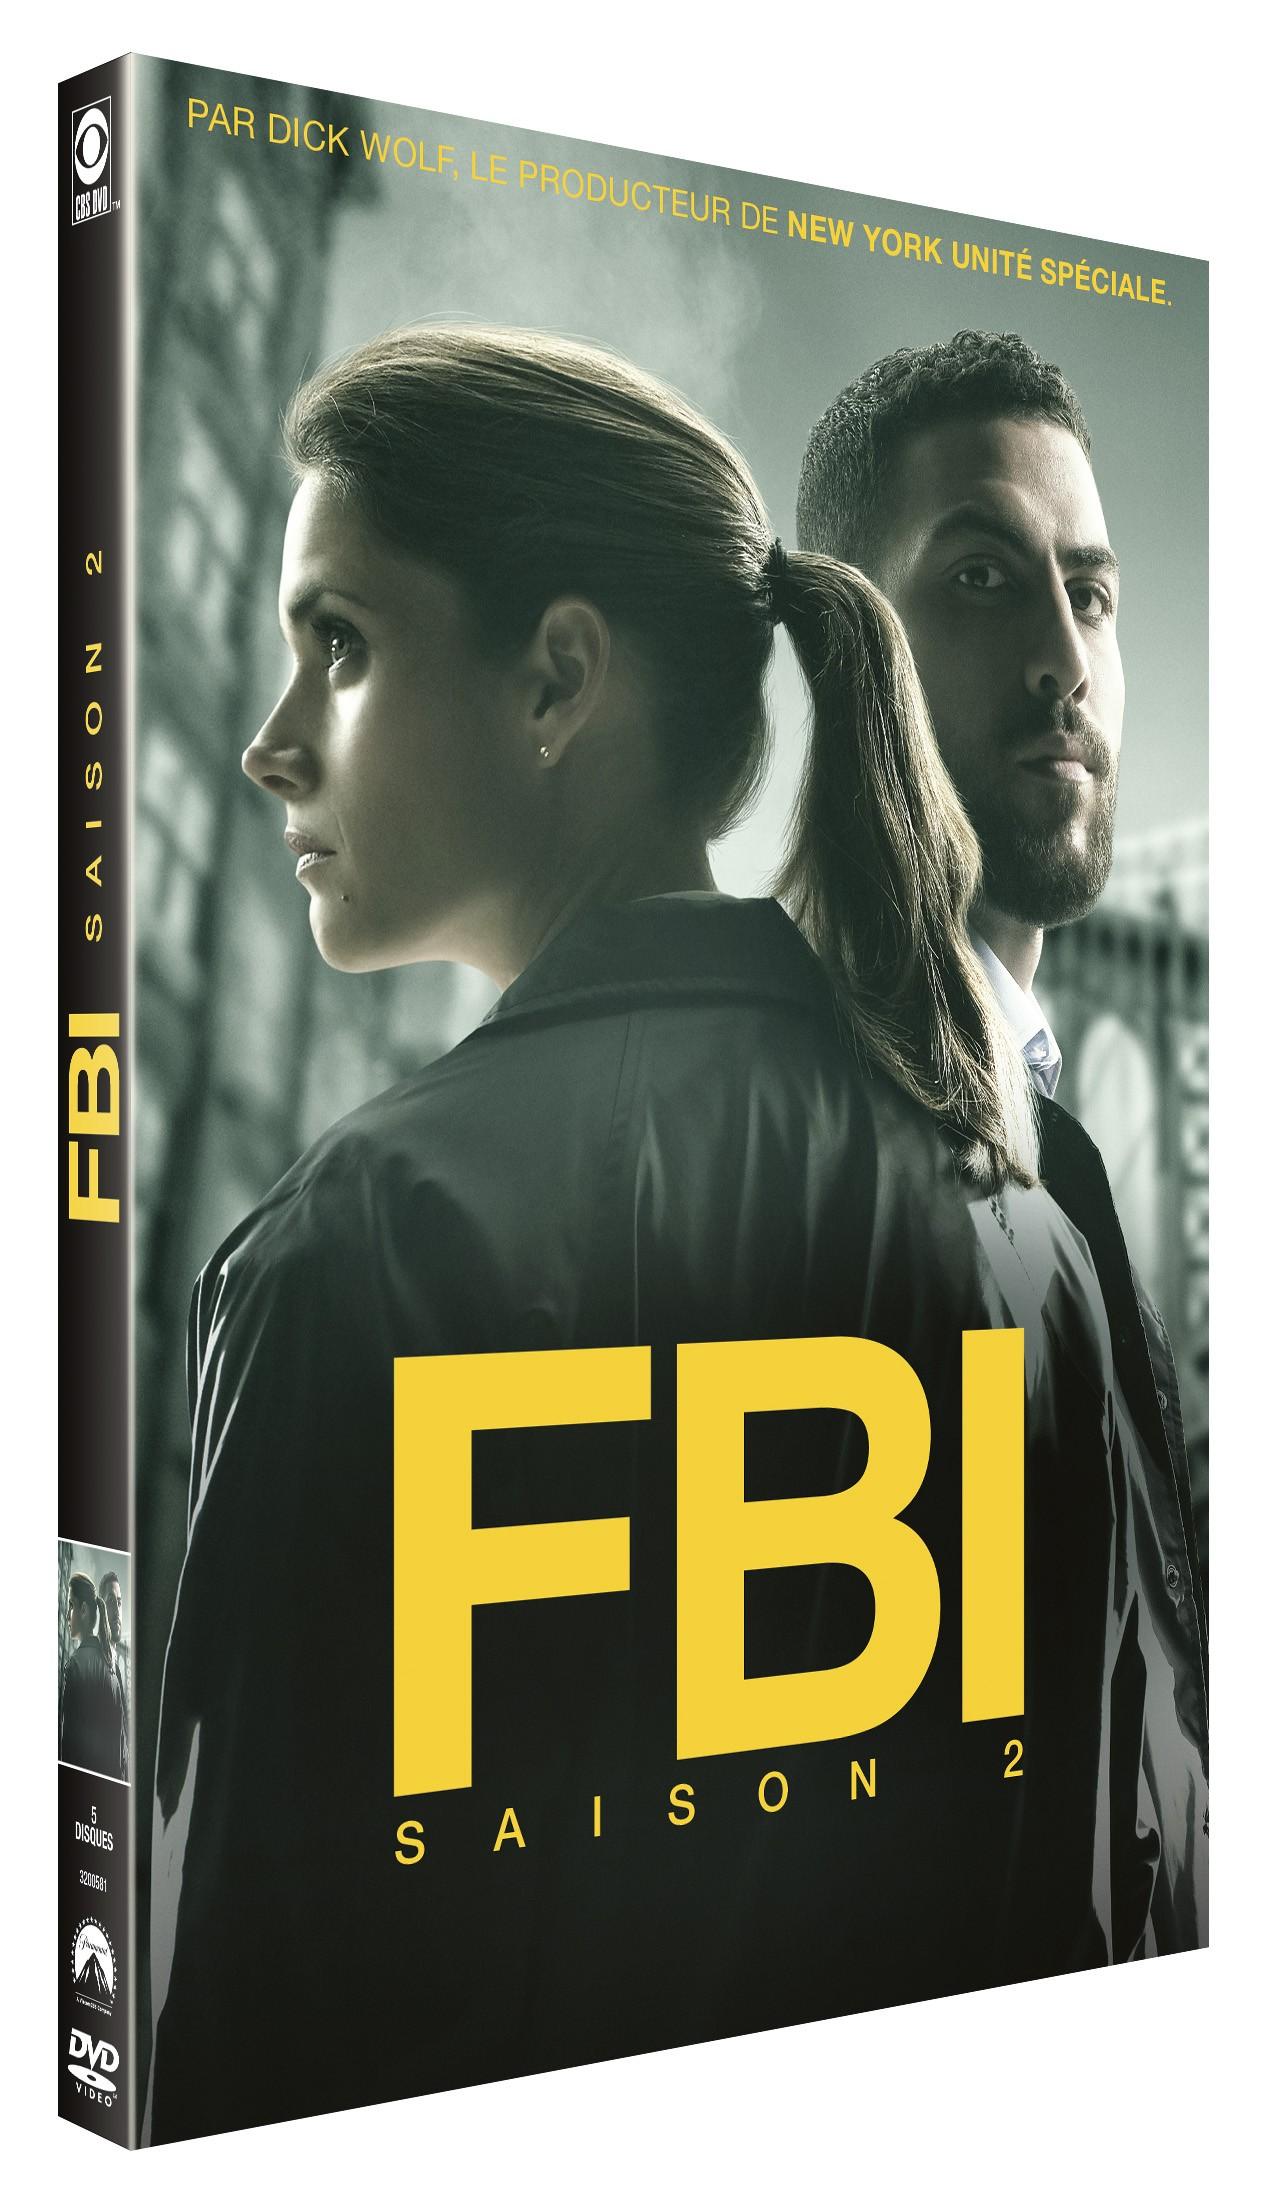 FBI SAISON 2 - 5 DVD